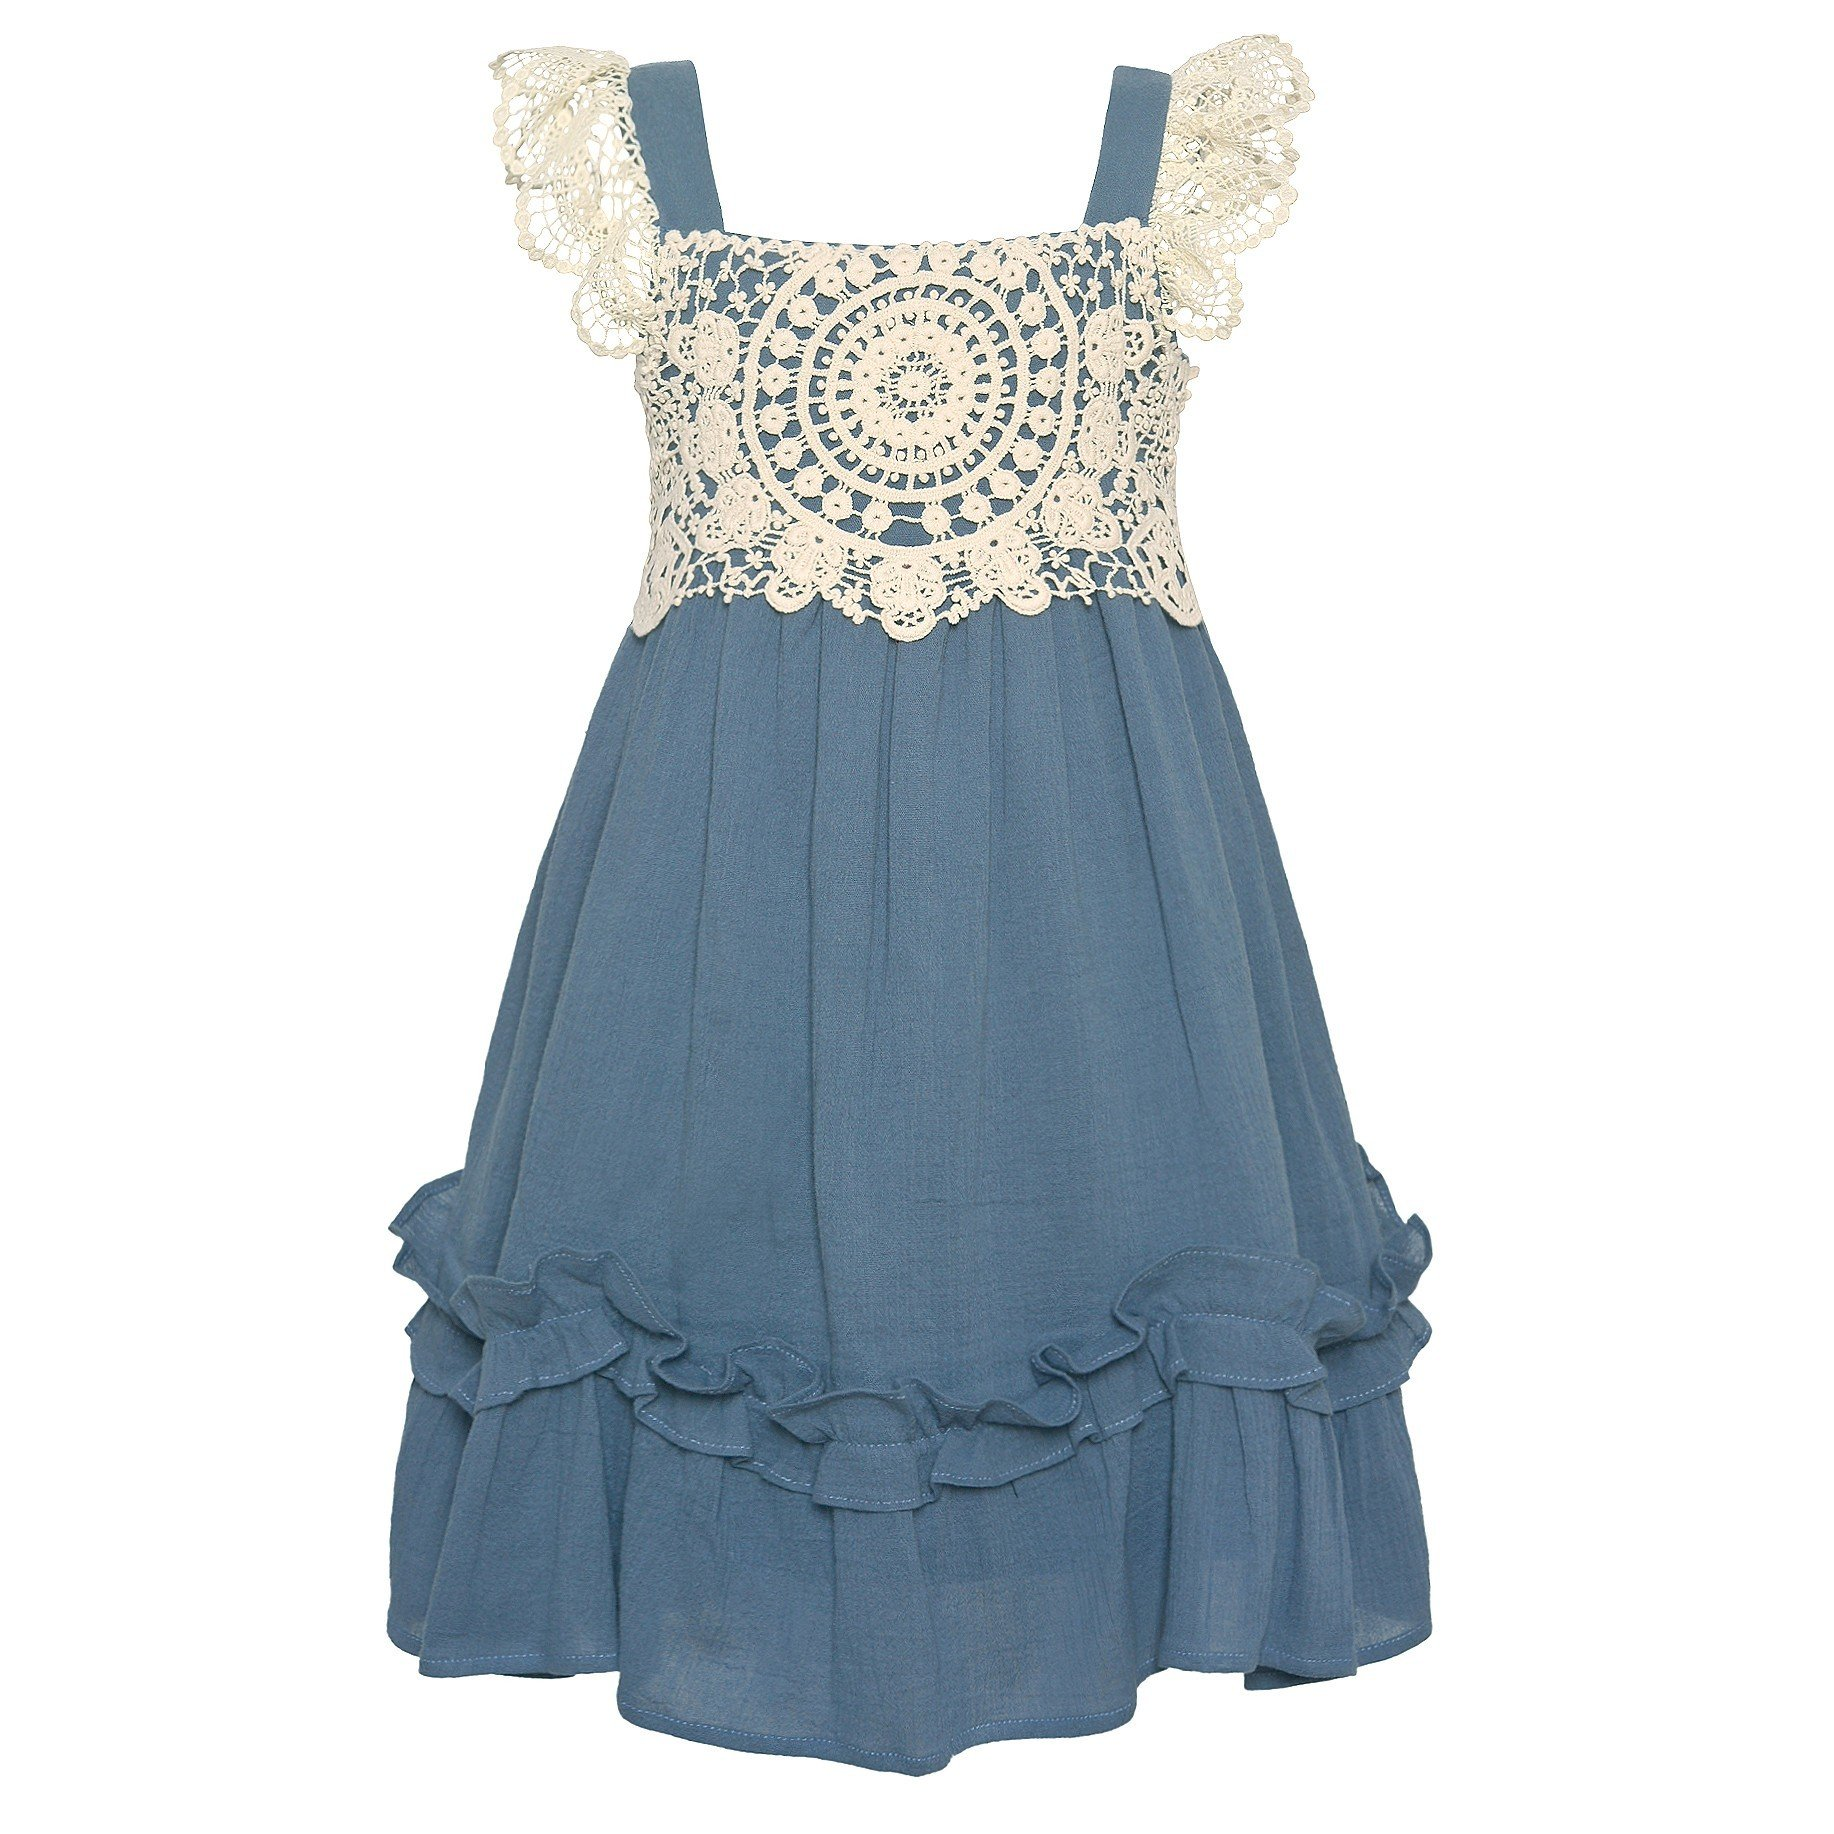 Bonnie Jean Little Girls Blue Cotton Lace Ruffle Back Tie Summer Dress 4T